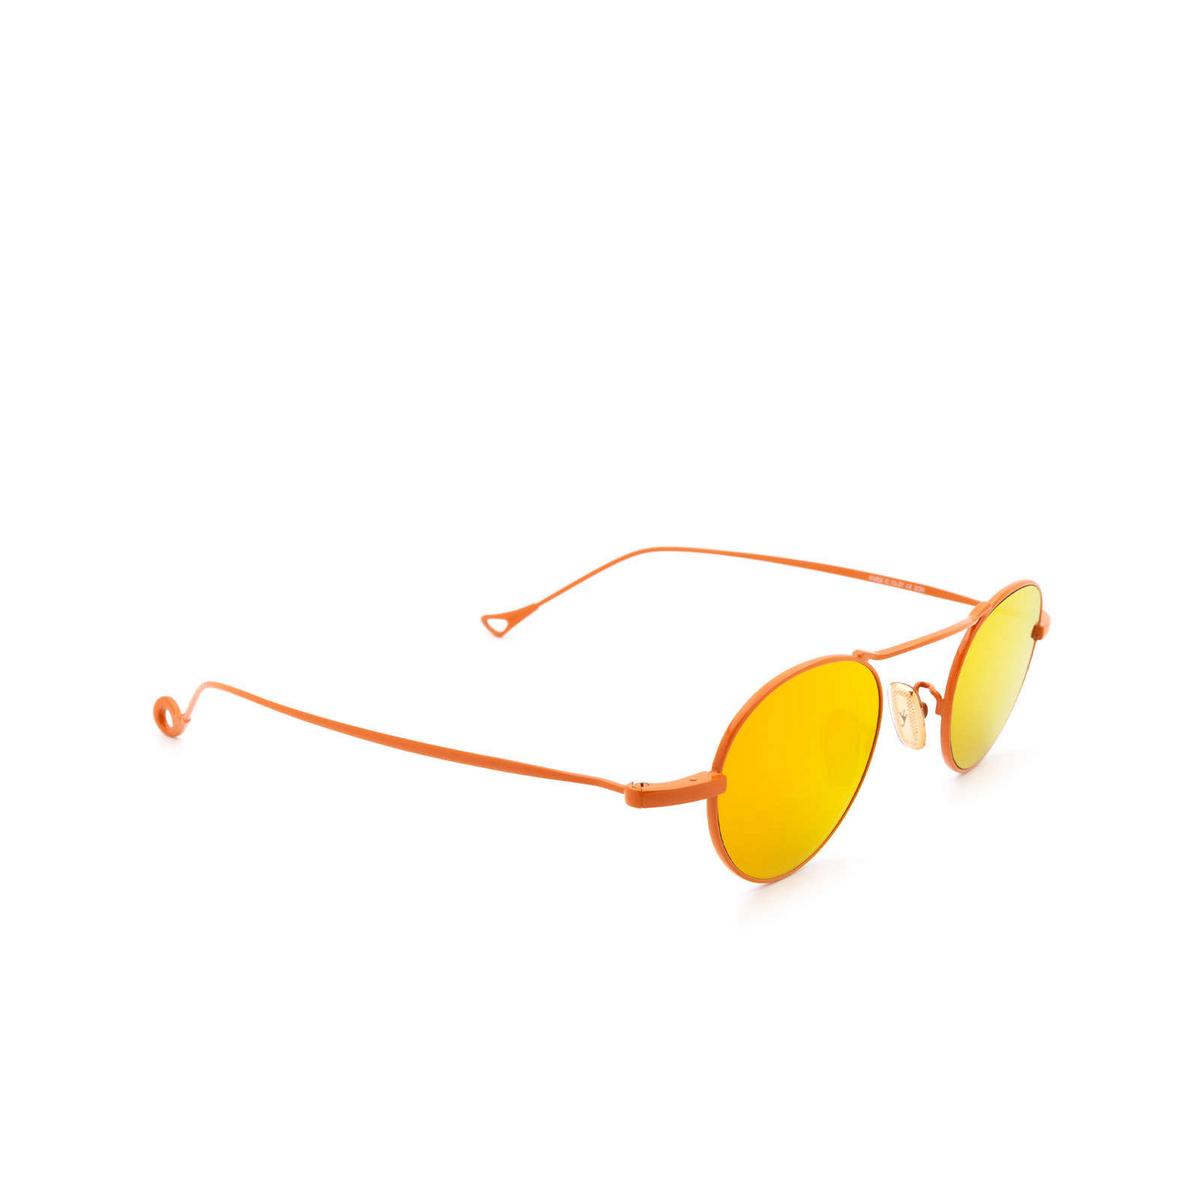 Eyepetizer® Round Sunglasses: Yves color Orange C.13-37 - three-quarters view.